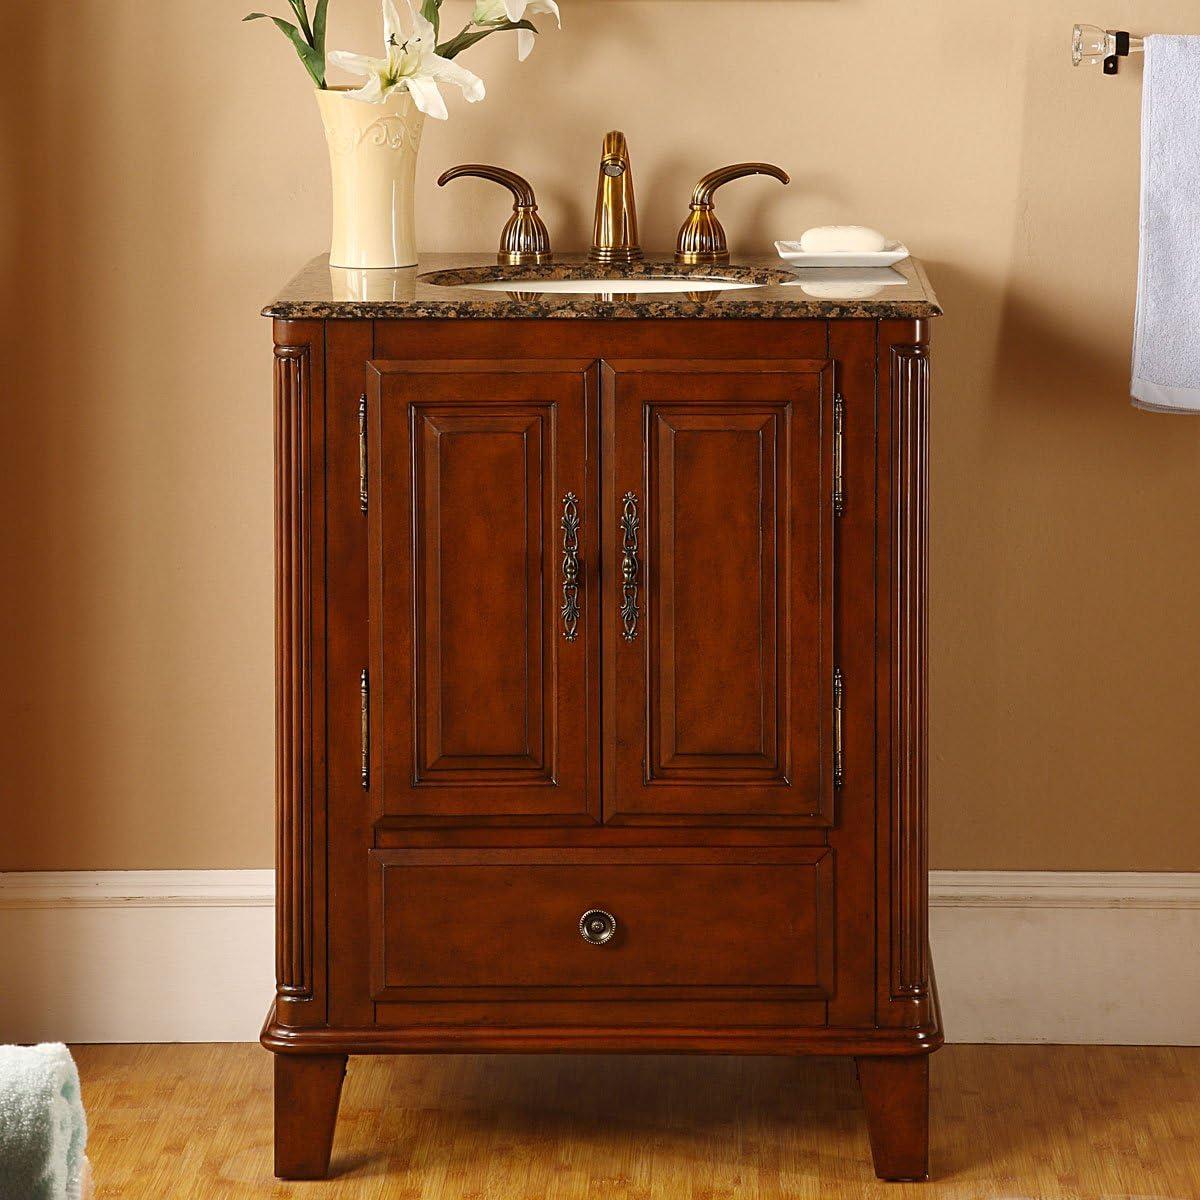 Feiss WB1723BS Amalia Vanity Wall Sconce Bathroom, Brushed Steel 1-Light 5 W x 16 H 75 Watts, 0